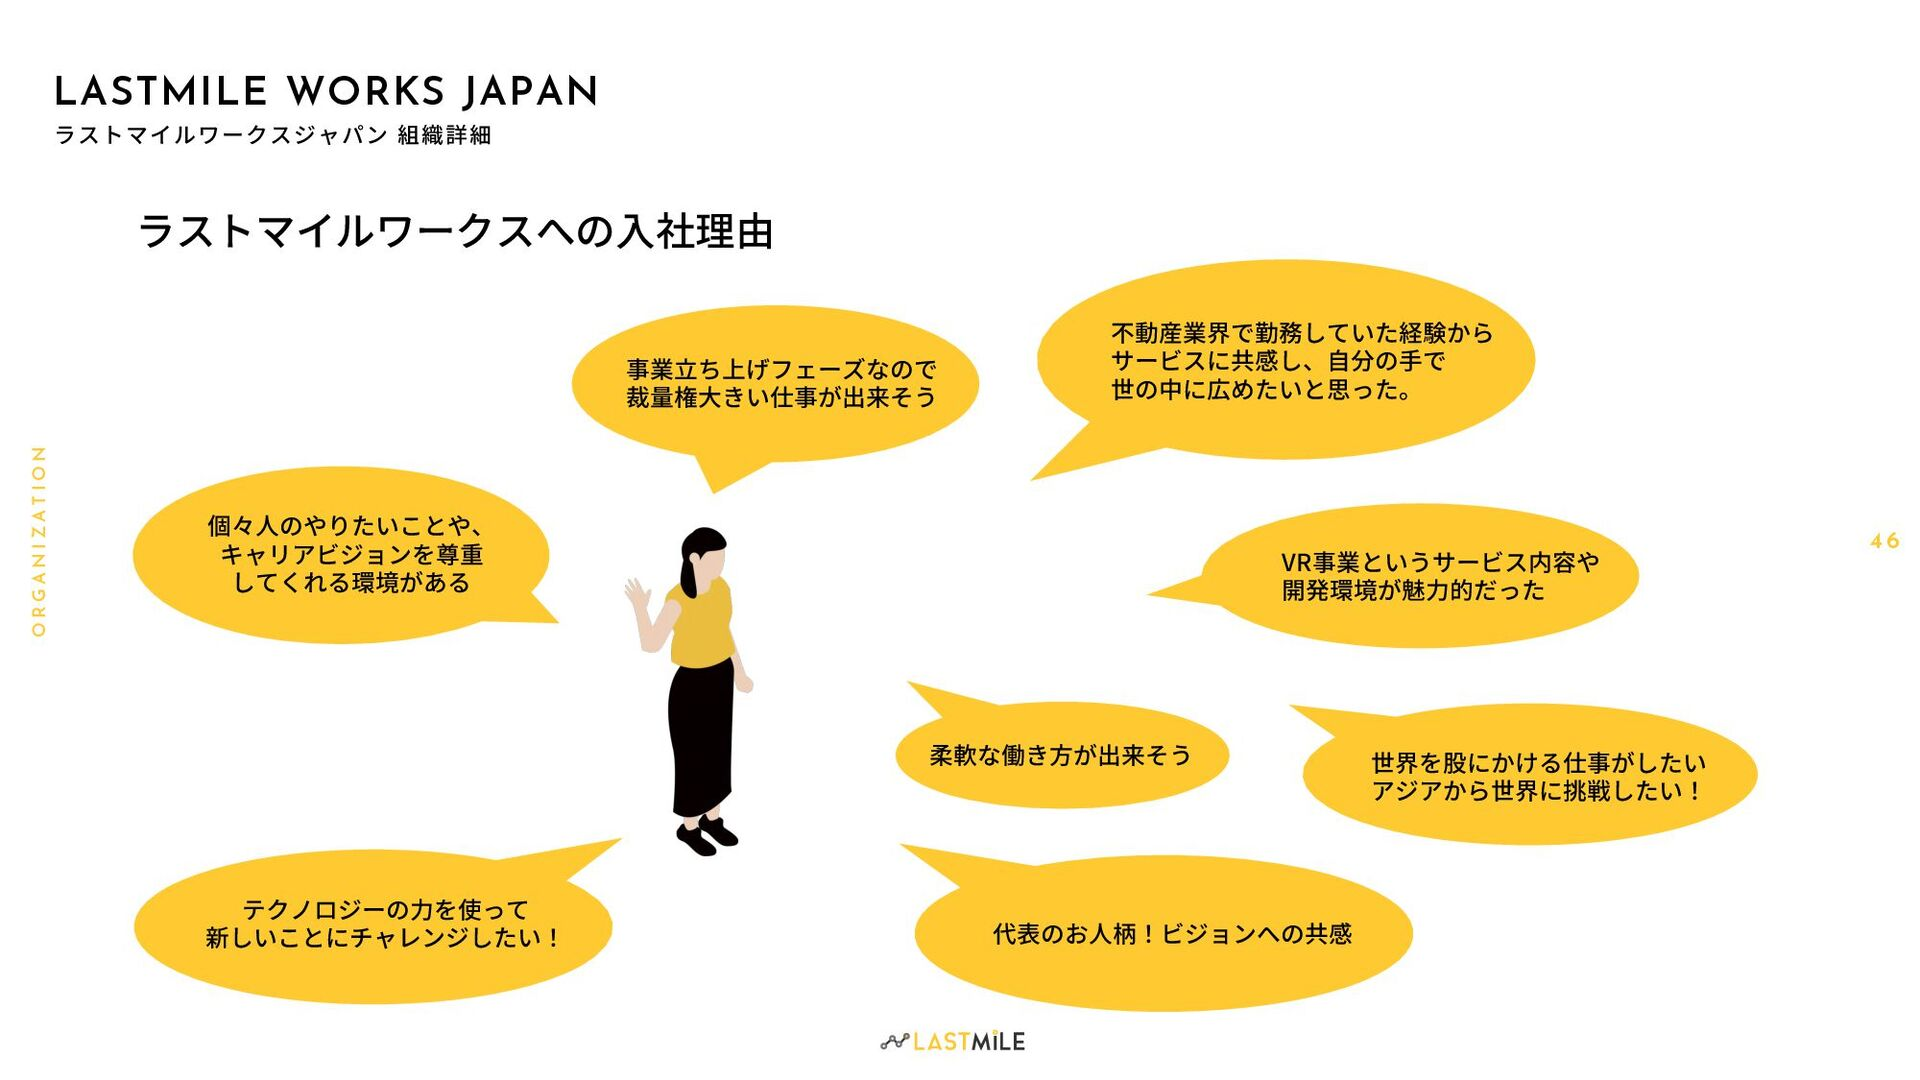 4 6 O R G A N I Z A T I O N LASTMILE WORKS JAPAN